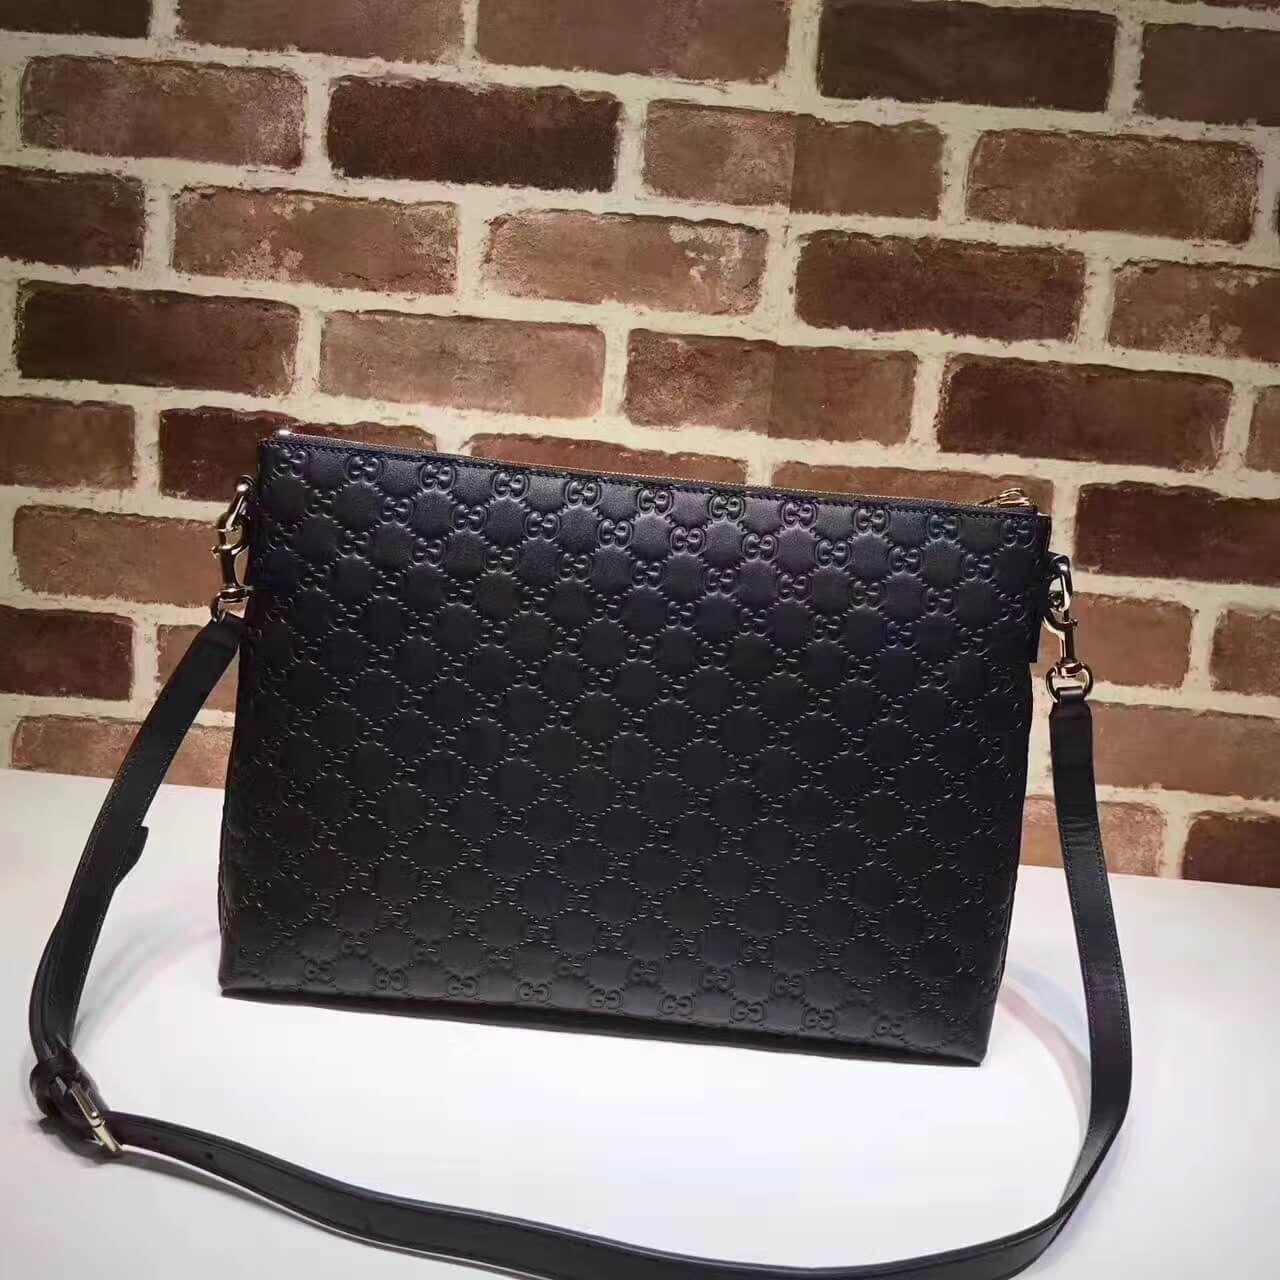 7bcc15cf73d2 Gucci Signature Soft Leather Messenger Bag 473882 Black 2017 | Black ...